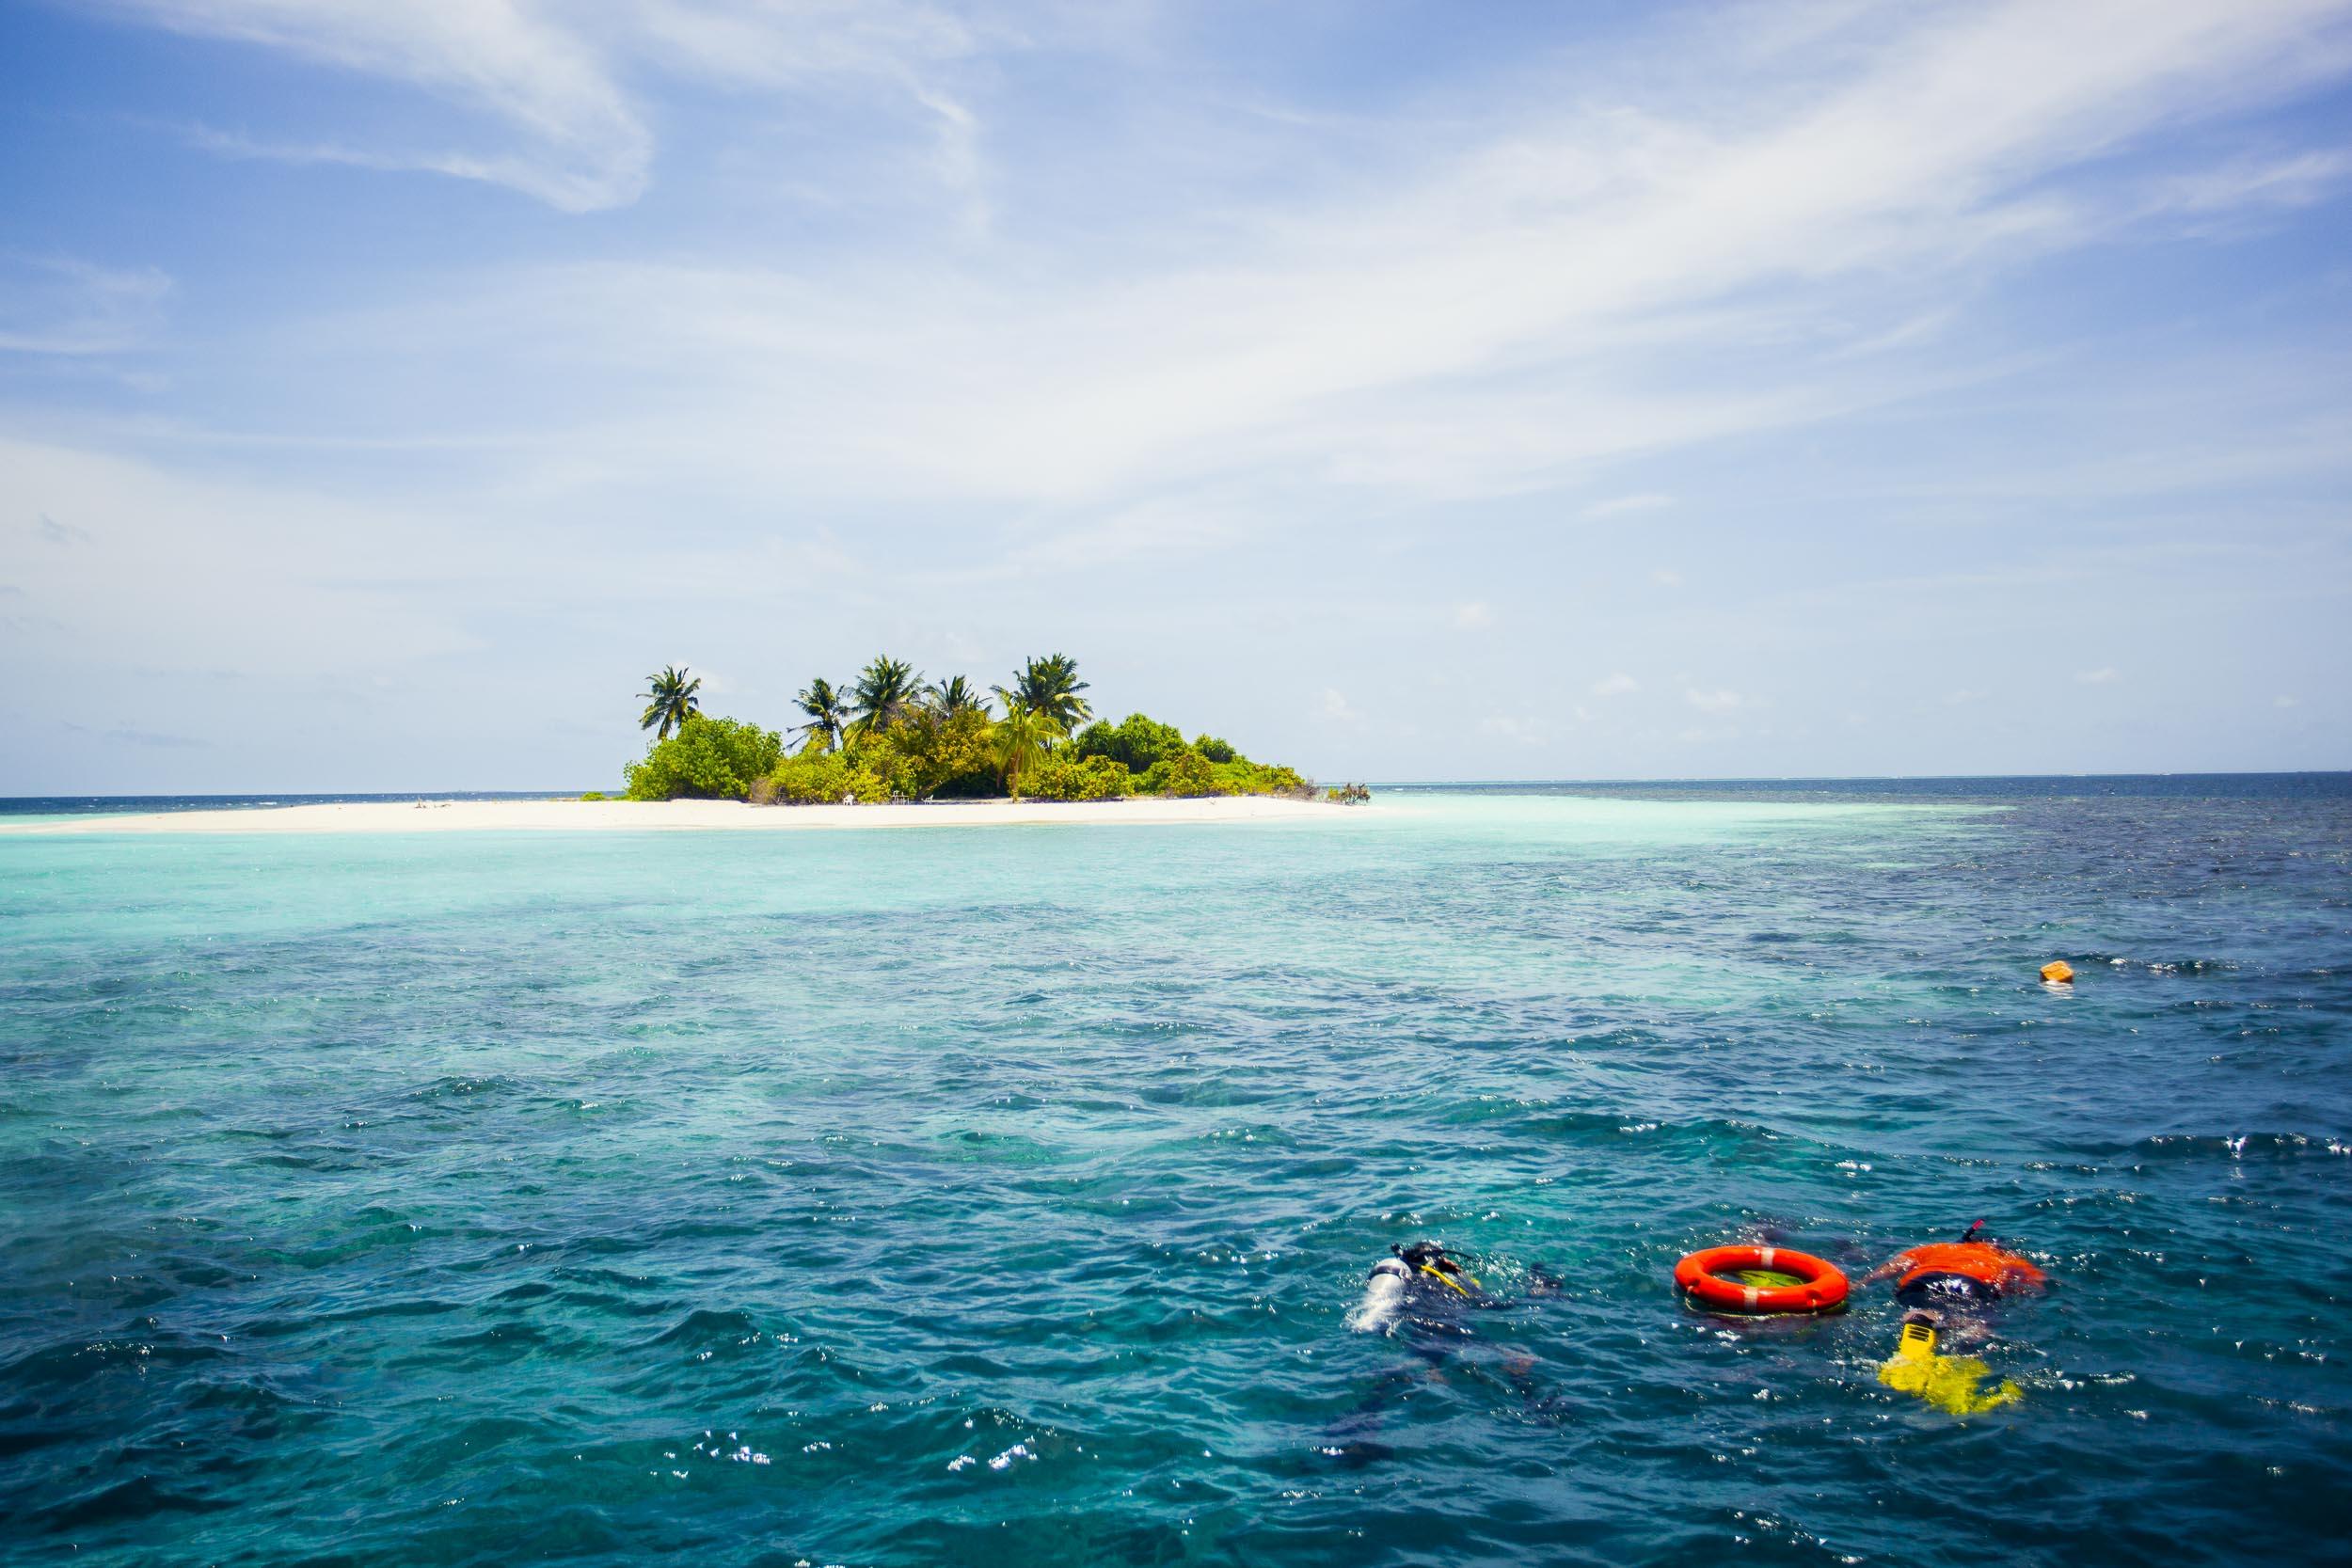 liveaboard-maldives-scuba-diving-4.jpg